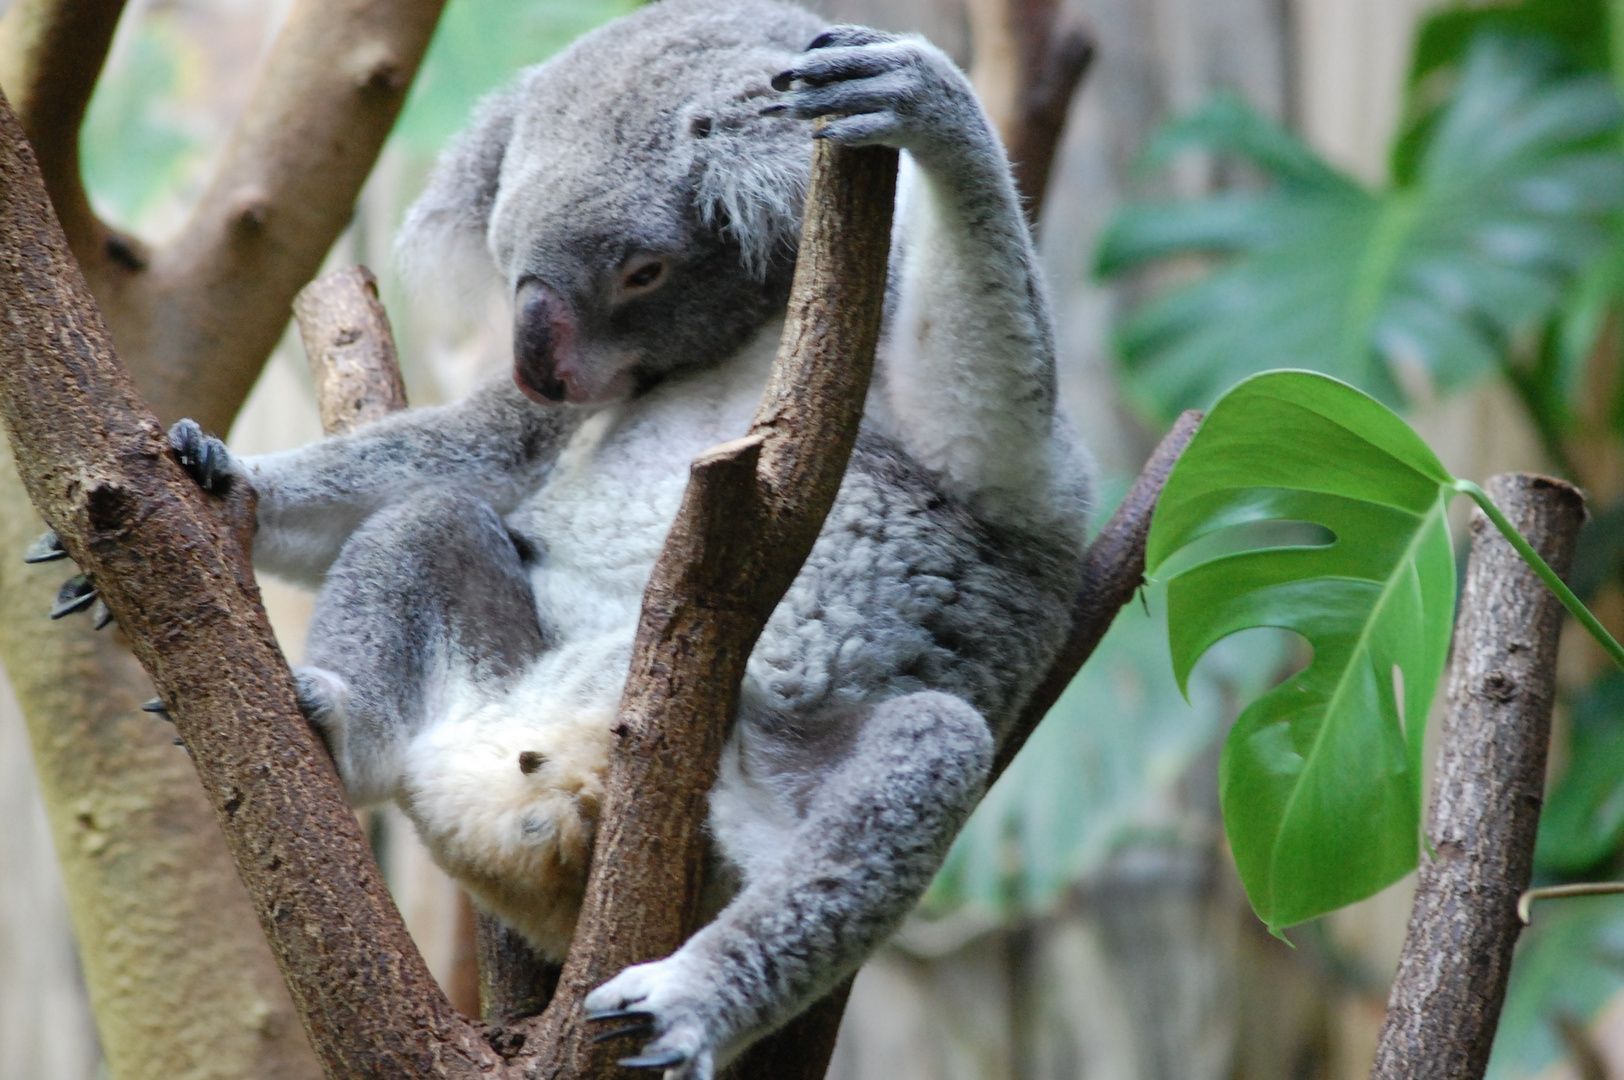 Zoo Duisburg Koala 2013